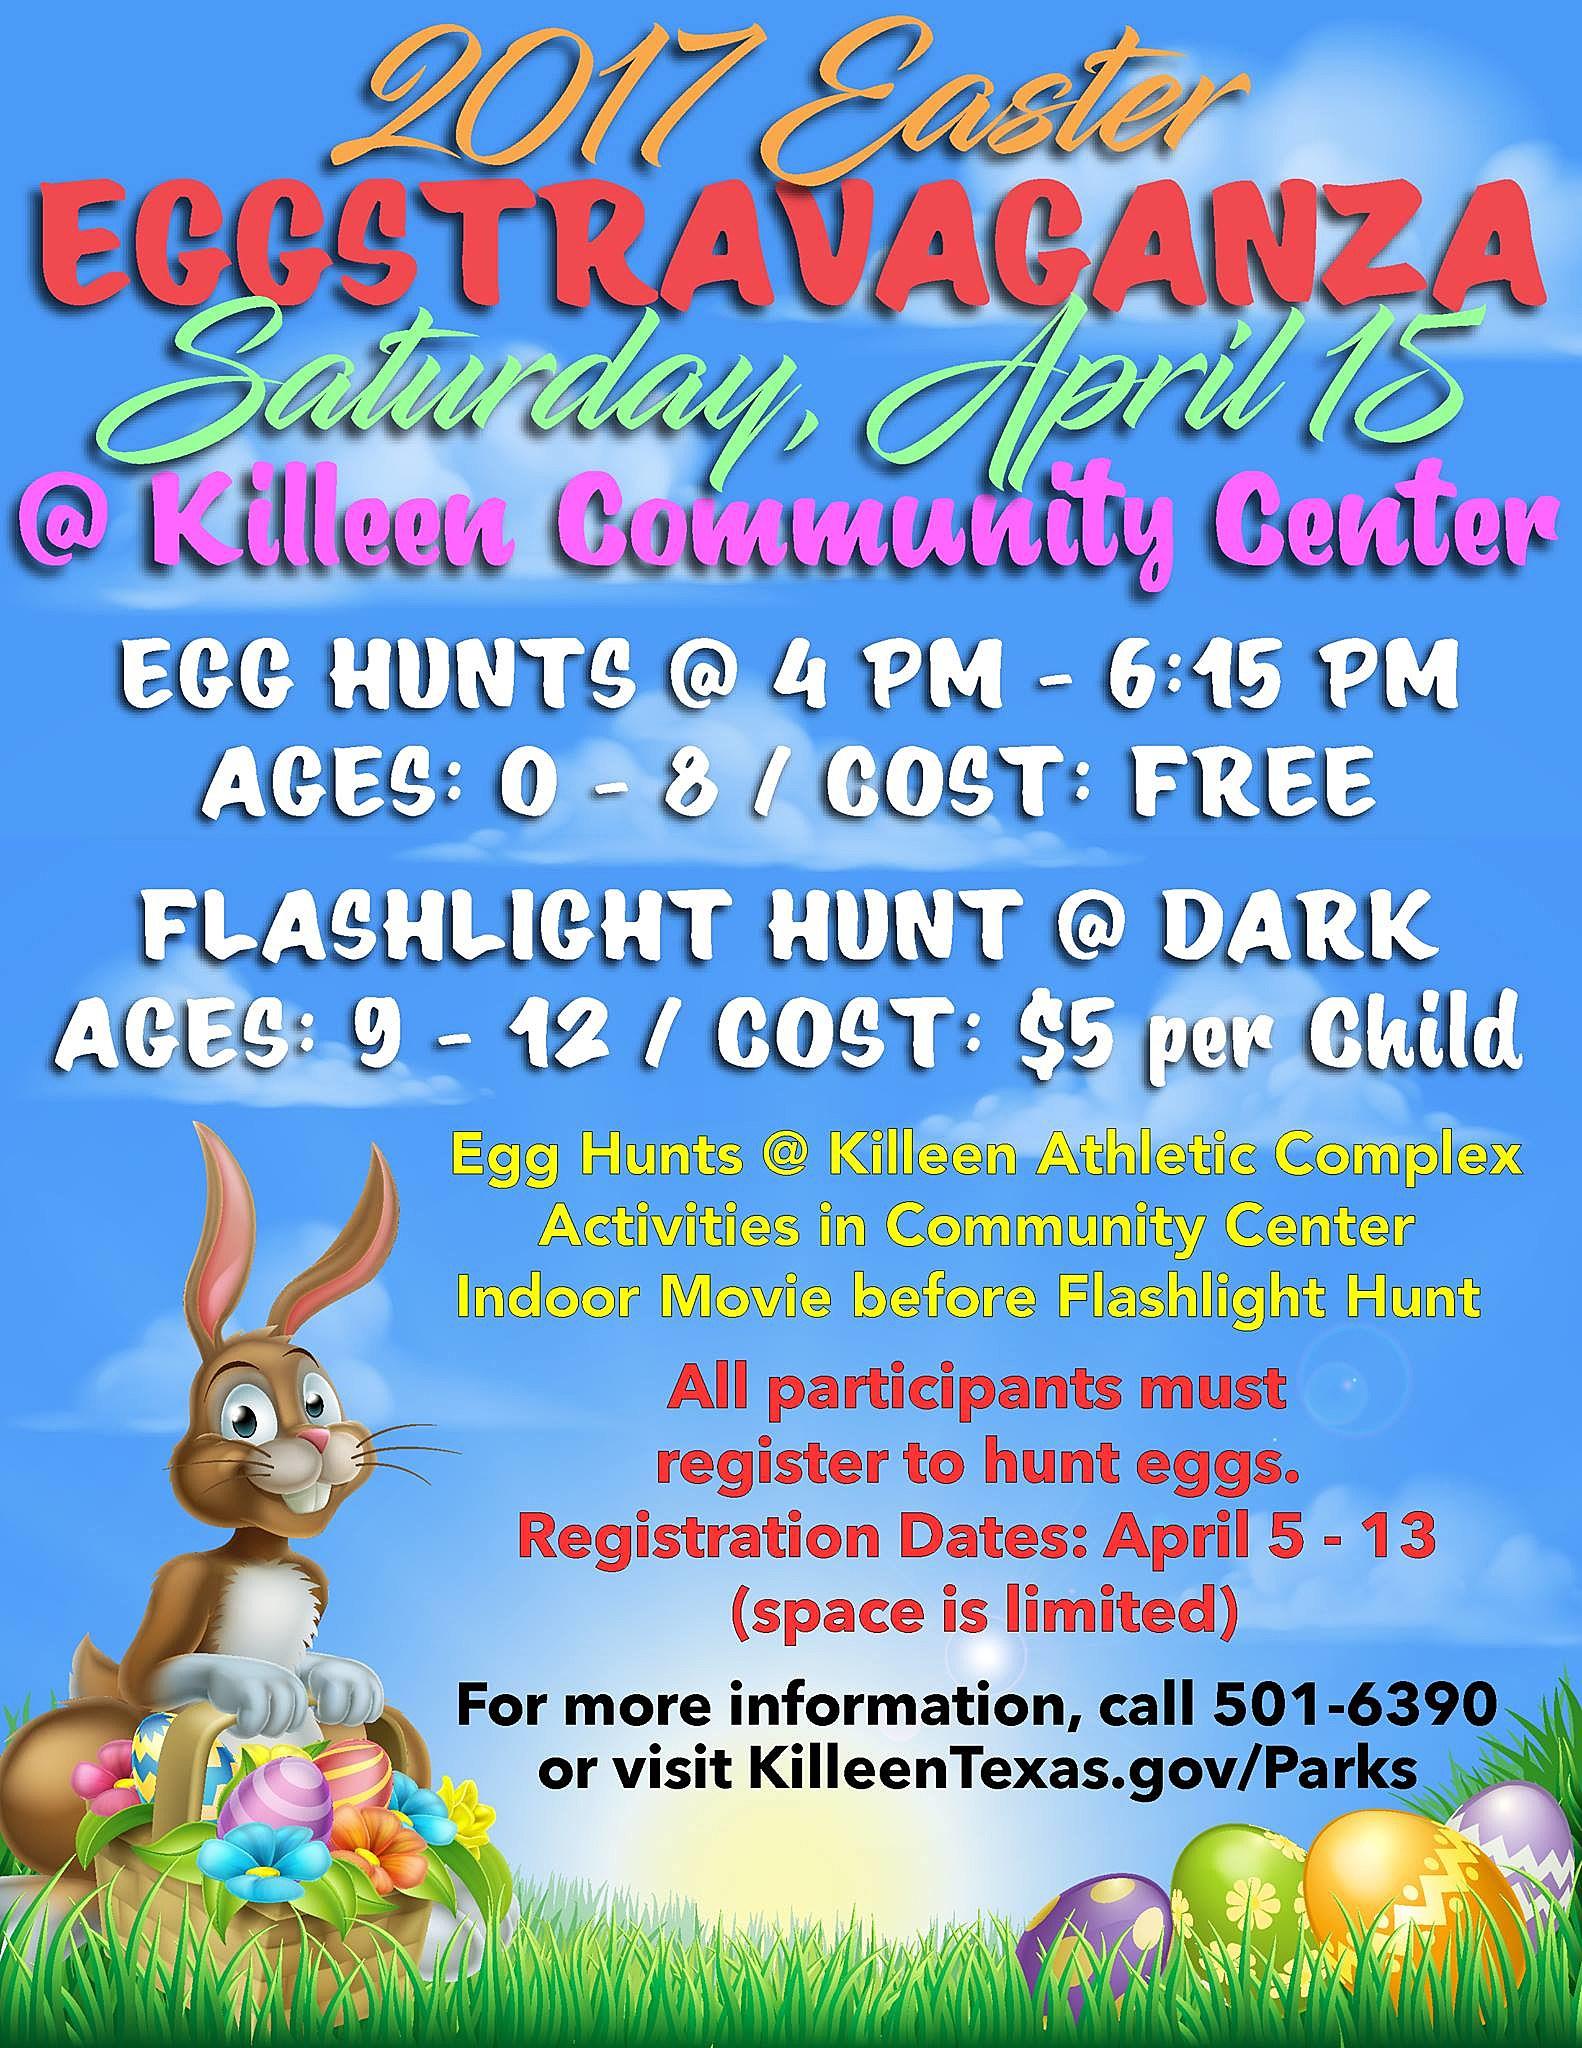 Easter Egg Hunts Around Killeen, Harker Heights & Central Texas